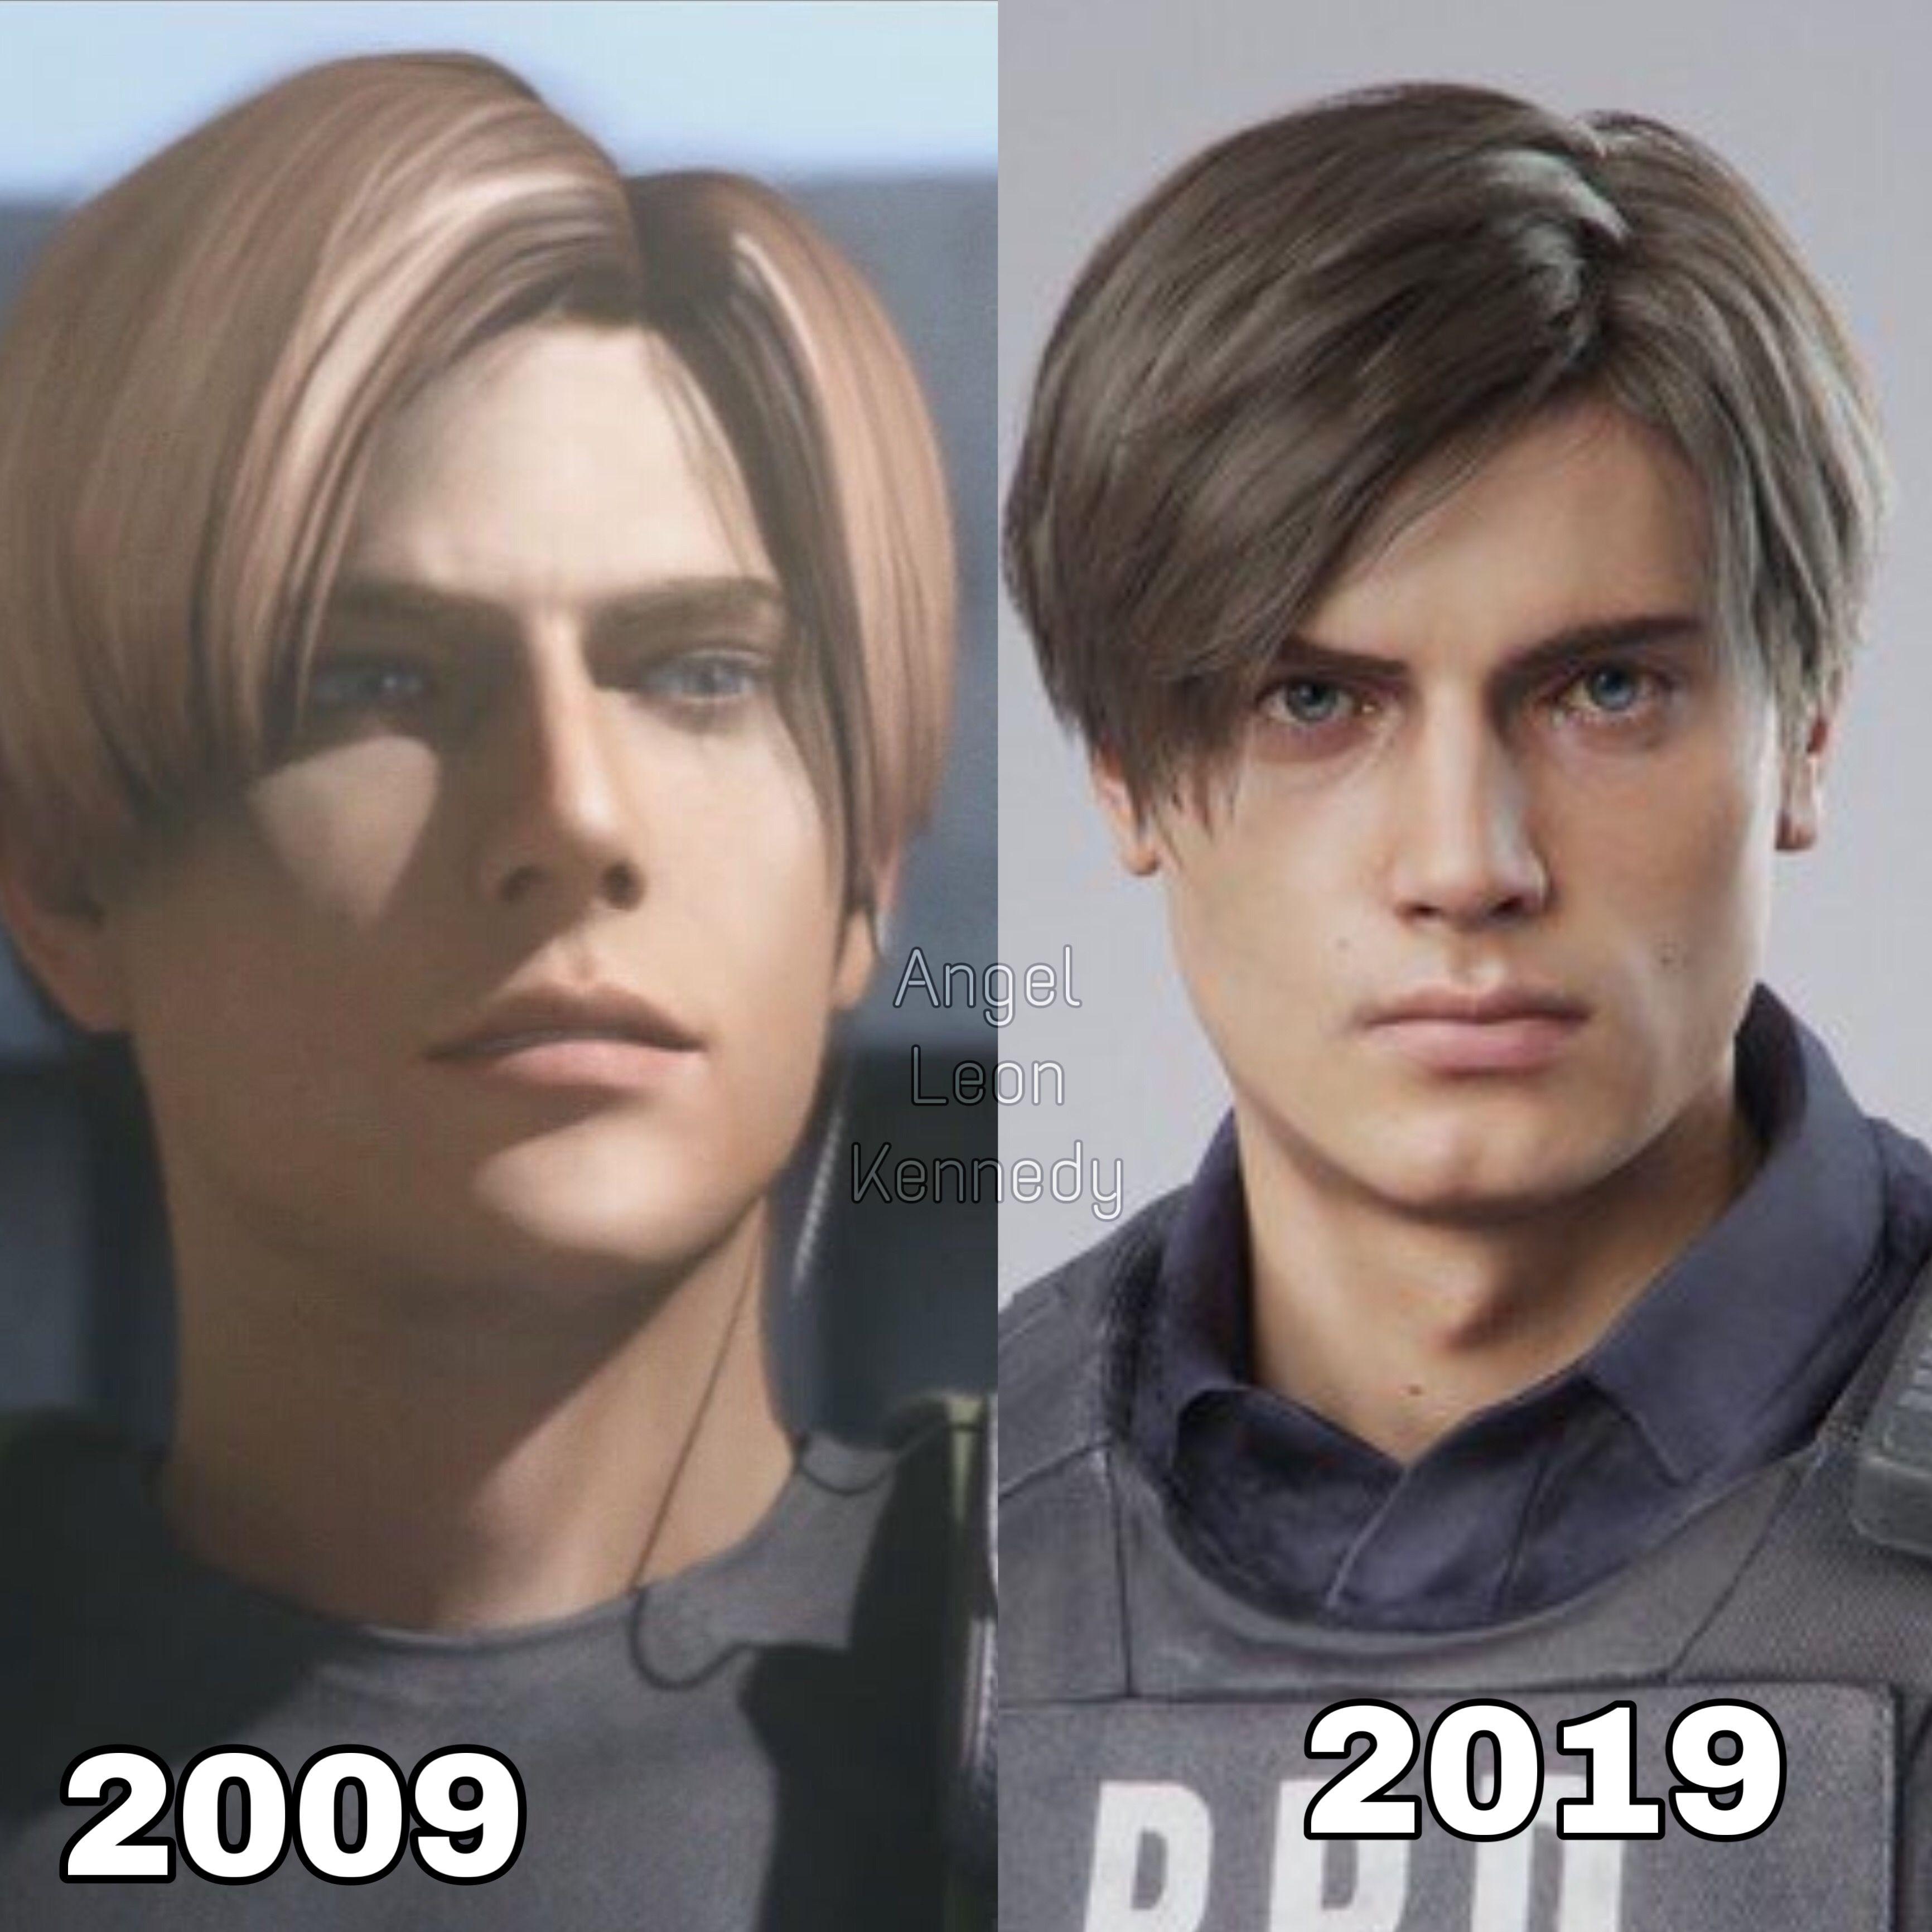 Leon Kennedy Then Now Resident Evil Leon Resident Evil Anime Resident Evil